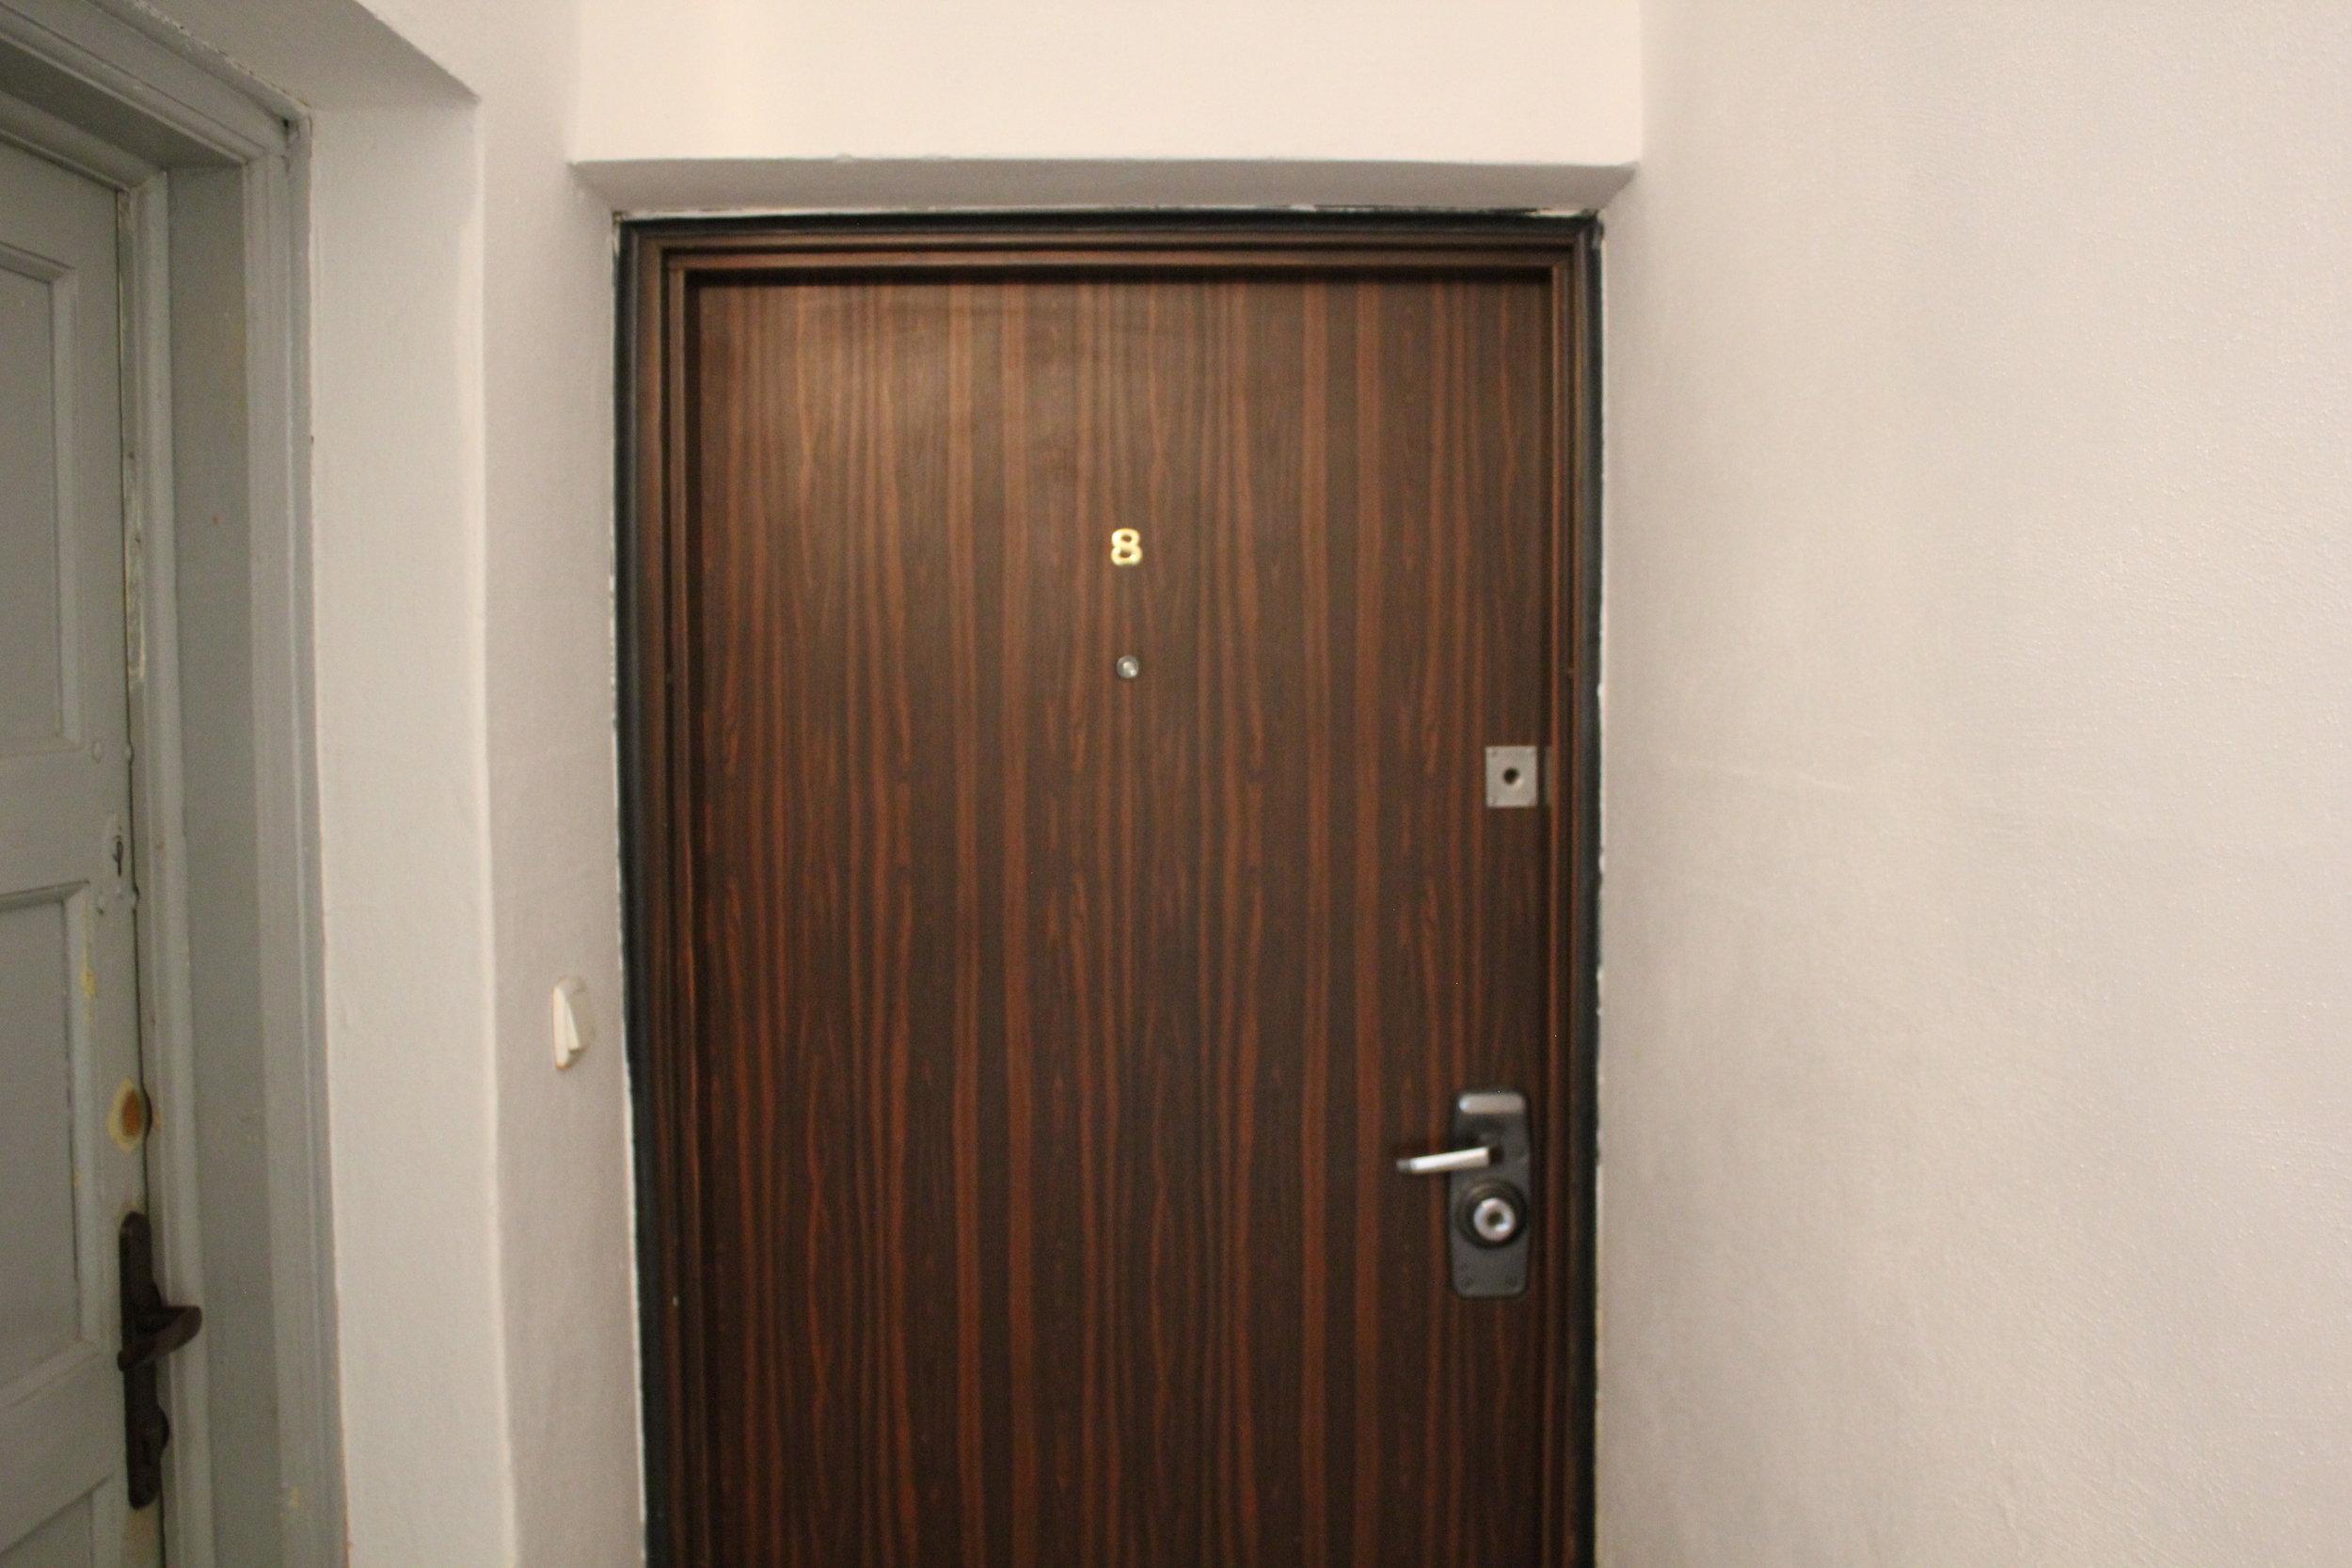 Apartament na Mariensztacie – Front door